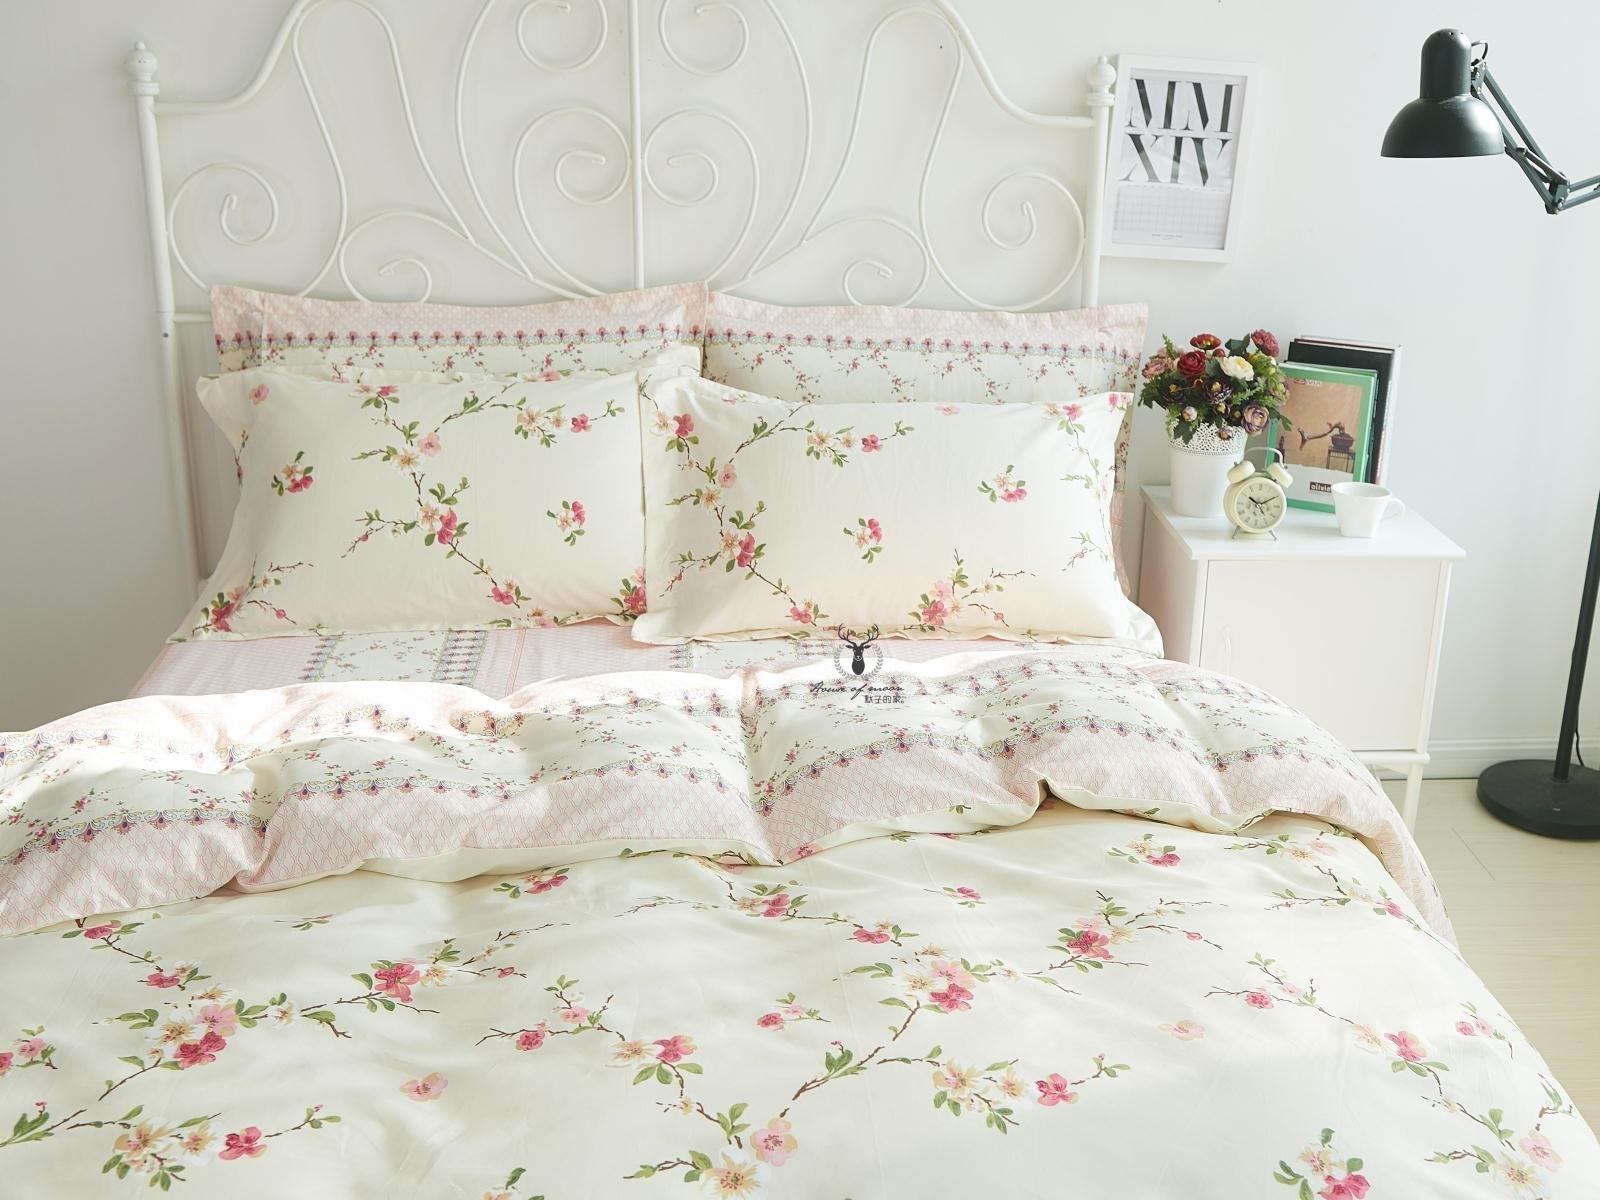 FADFAY Girls Shabby Duvet Cover Sets Floral Cotton Bedding Set Queen 4PCS(1flat Sheet+1duvet Cover+2pillowcases)